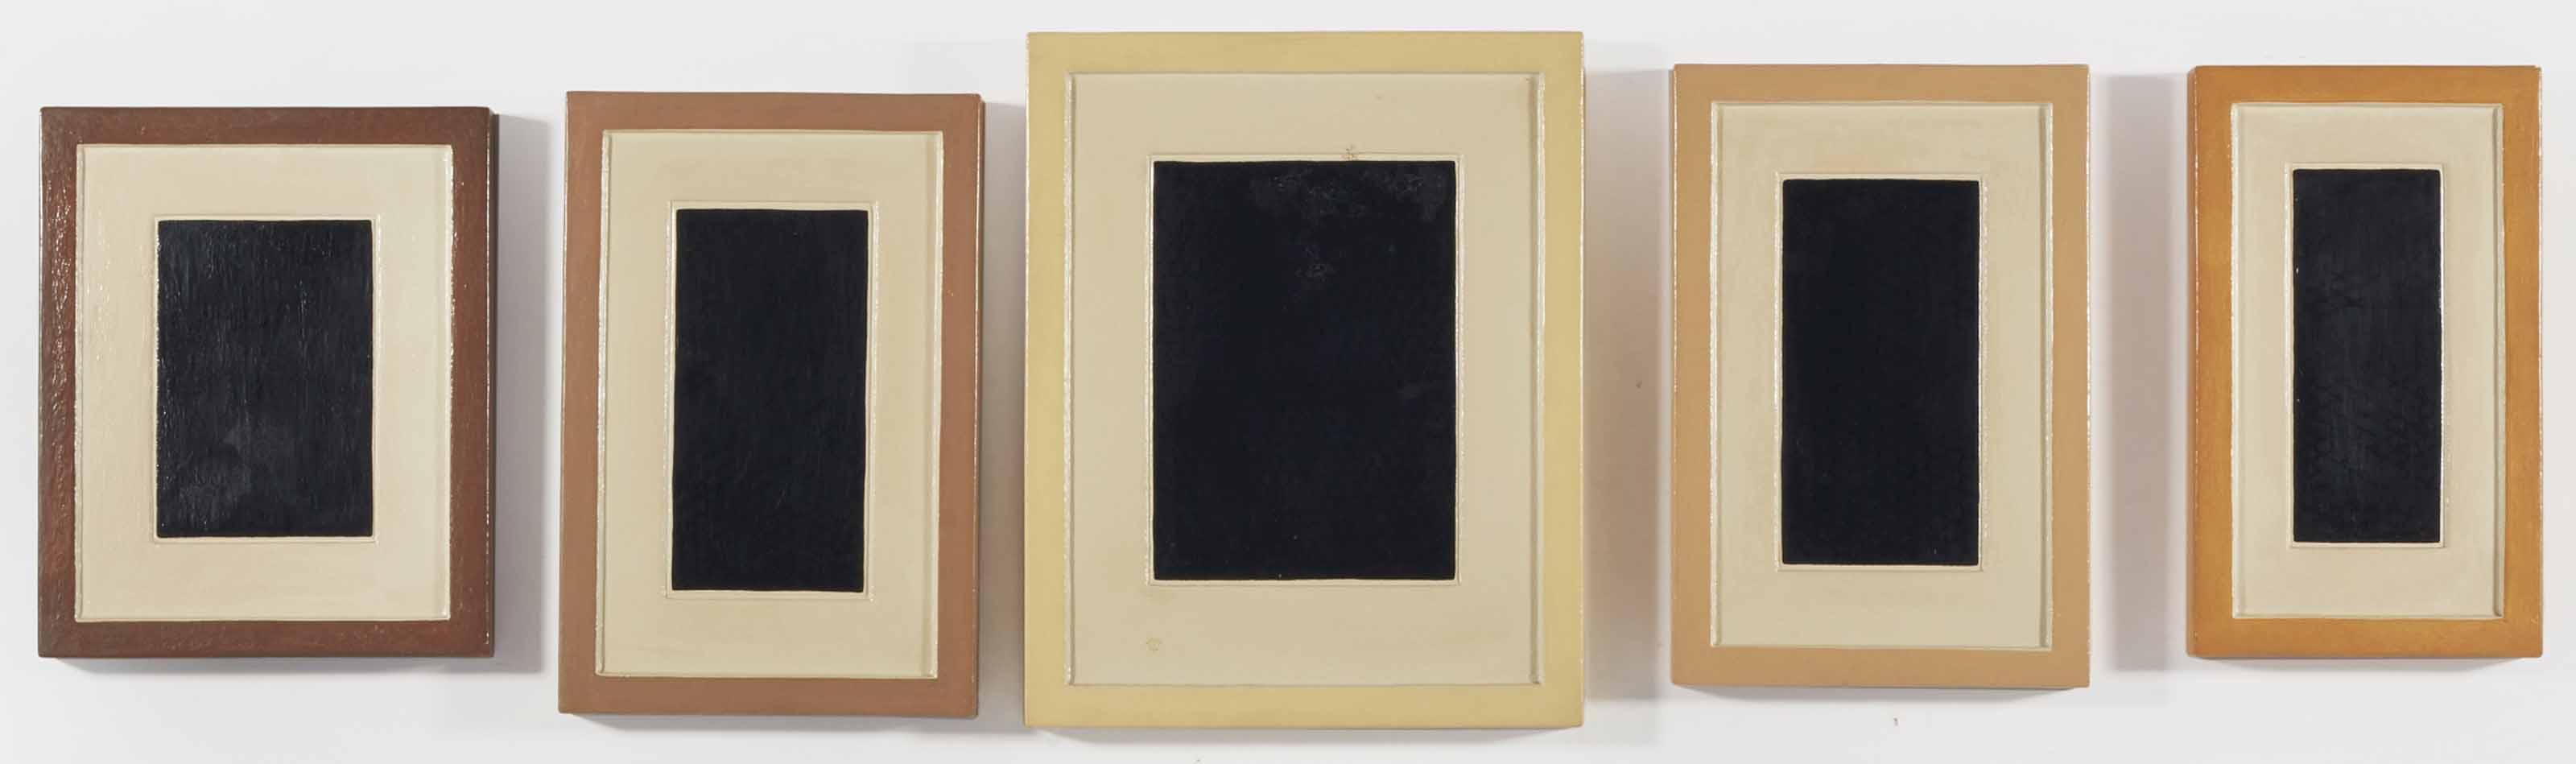 Collection of Five Plaster Surrogates